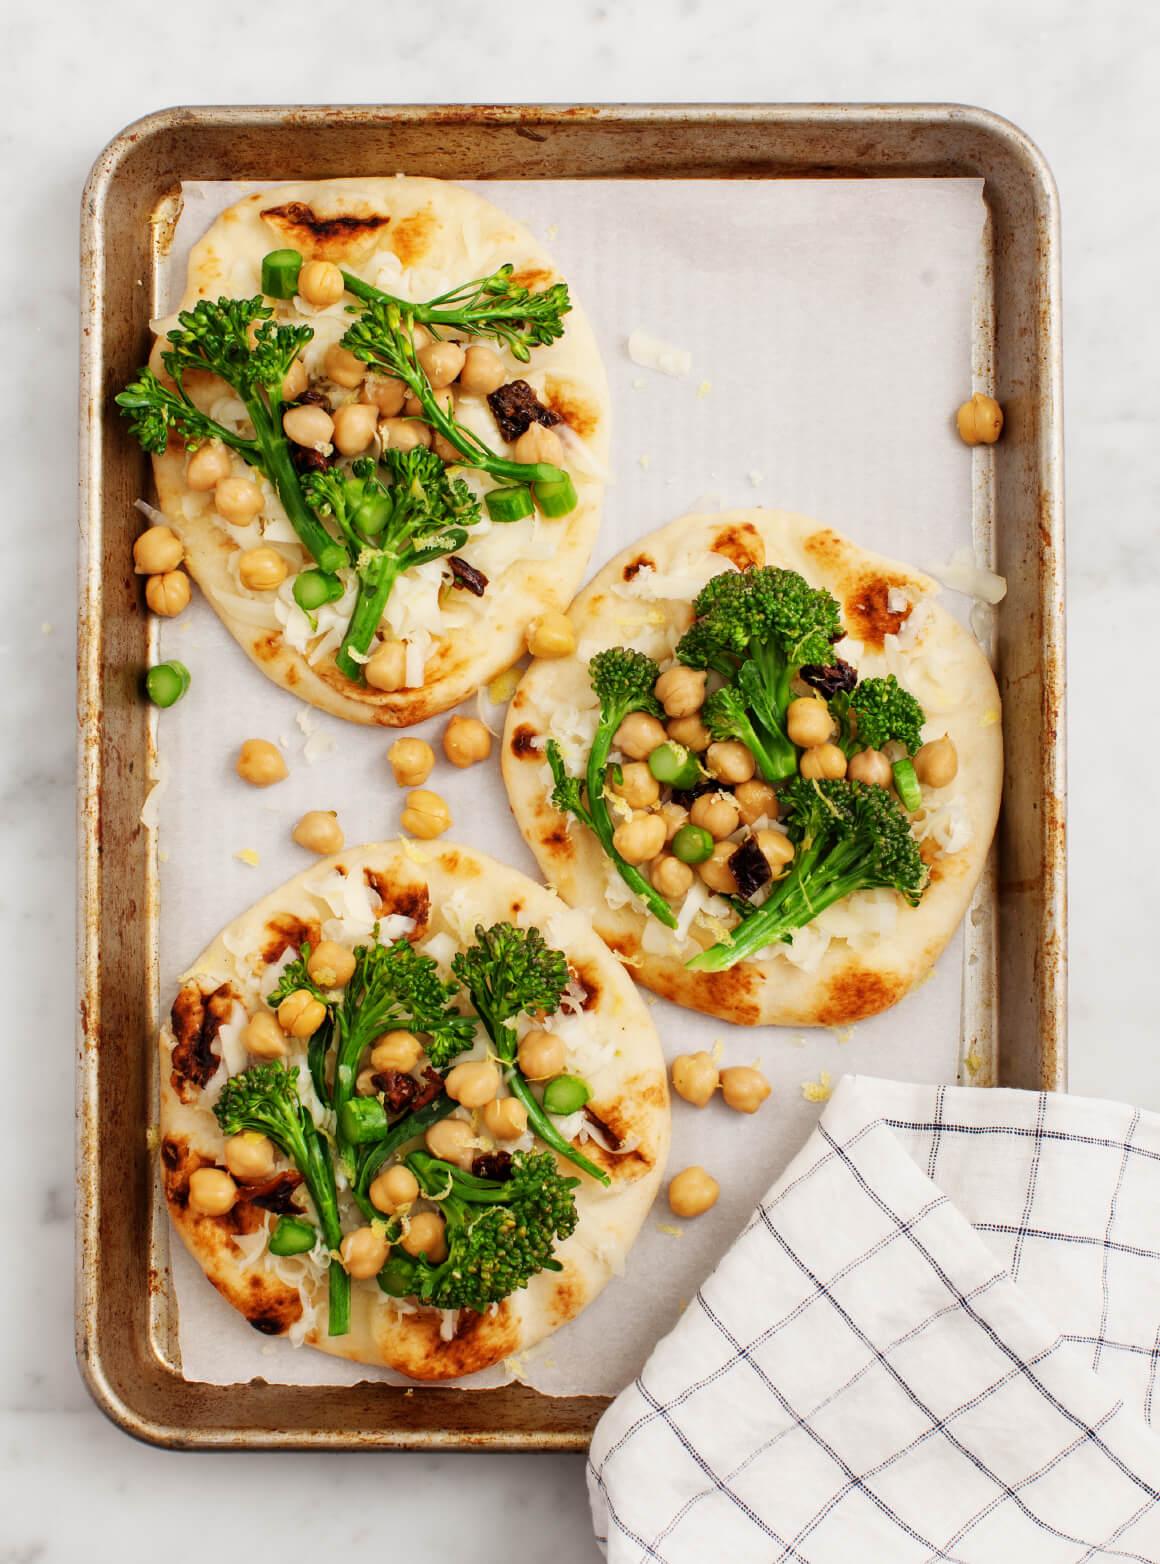 Jenny's Broccolini Chickpea Pizza från bloggen Love and Lemons